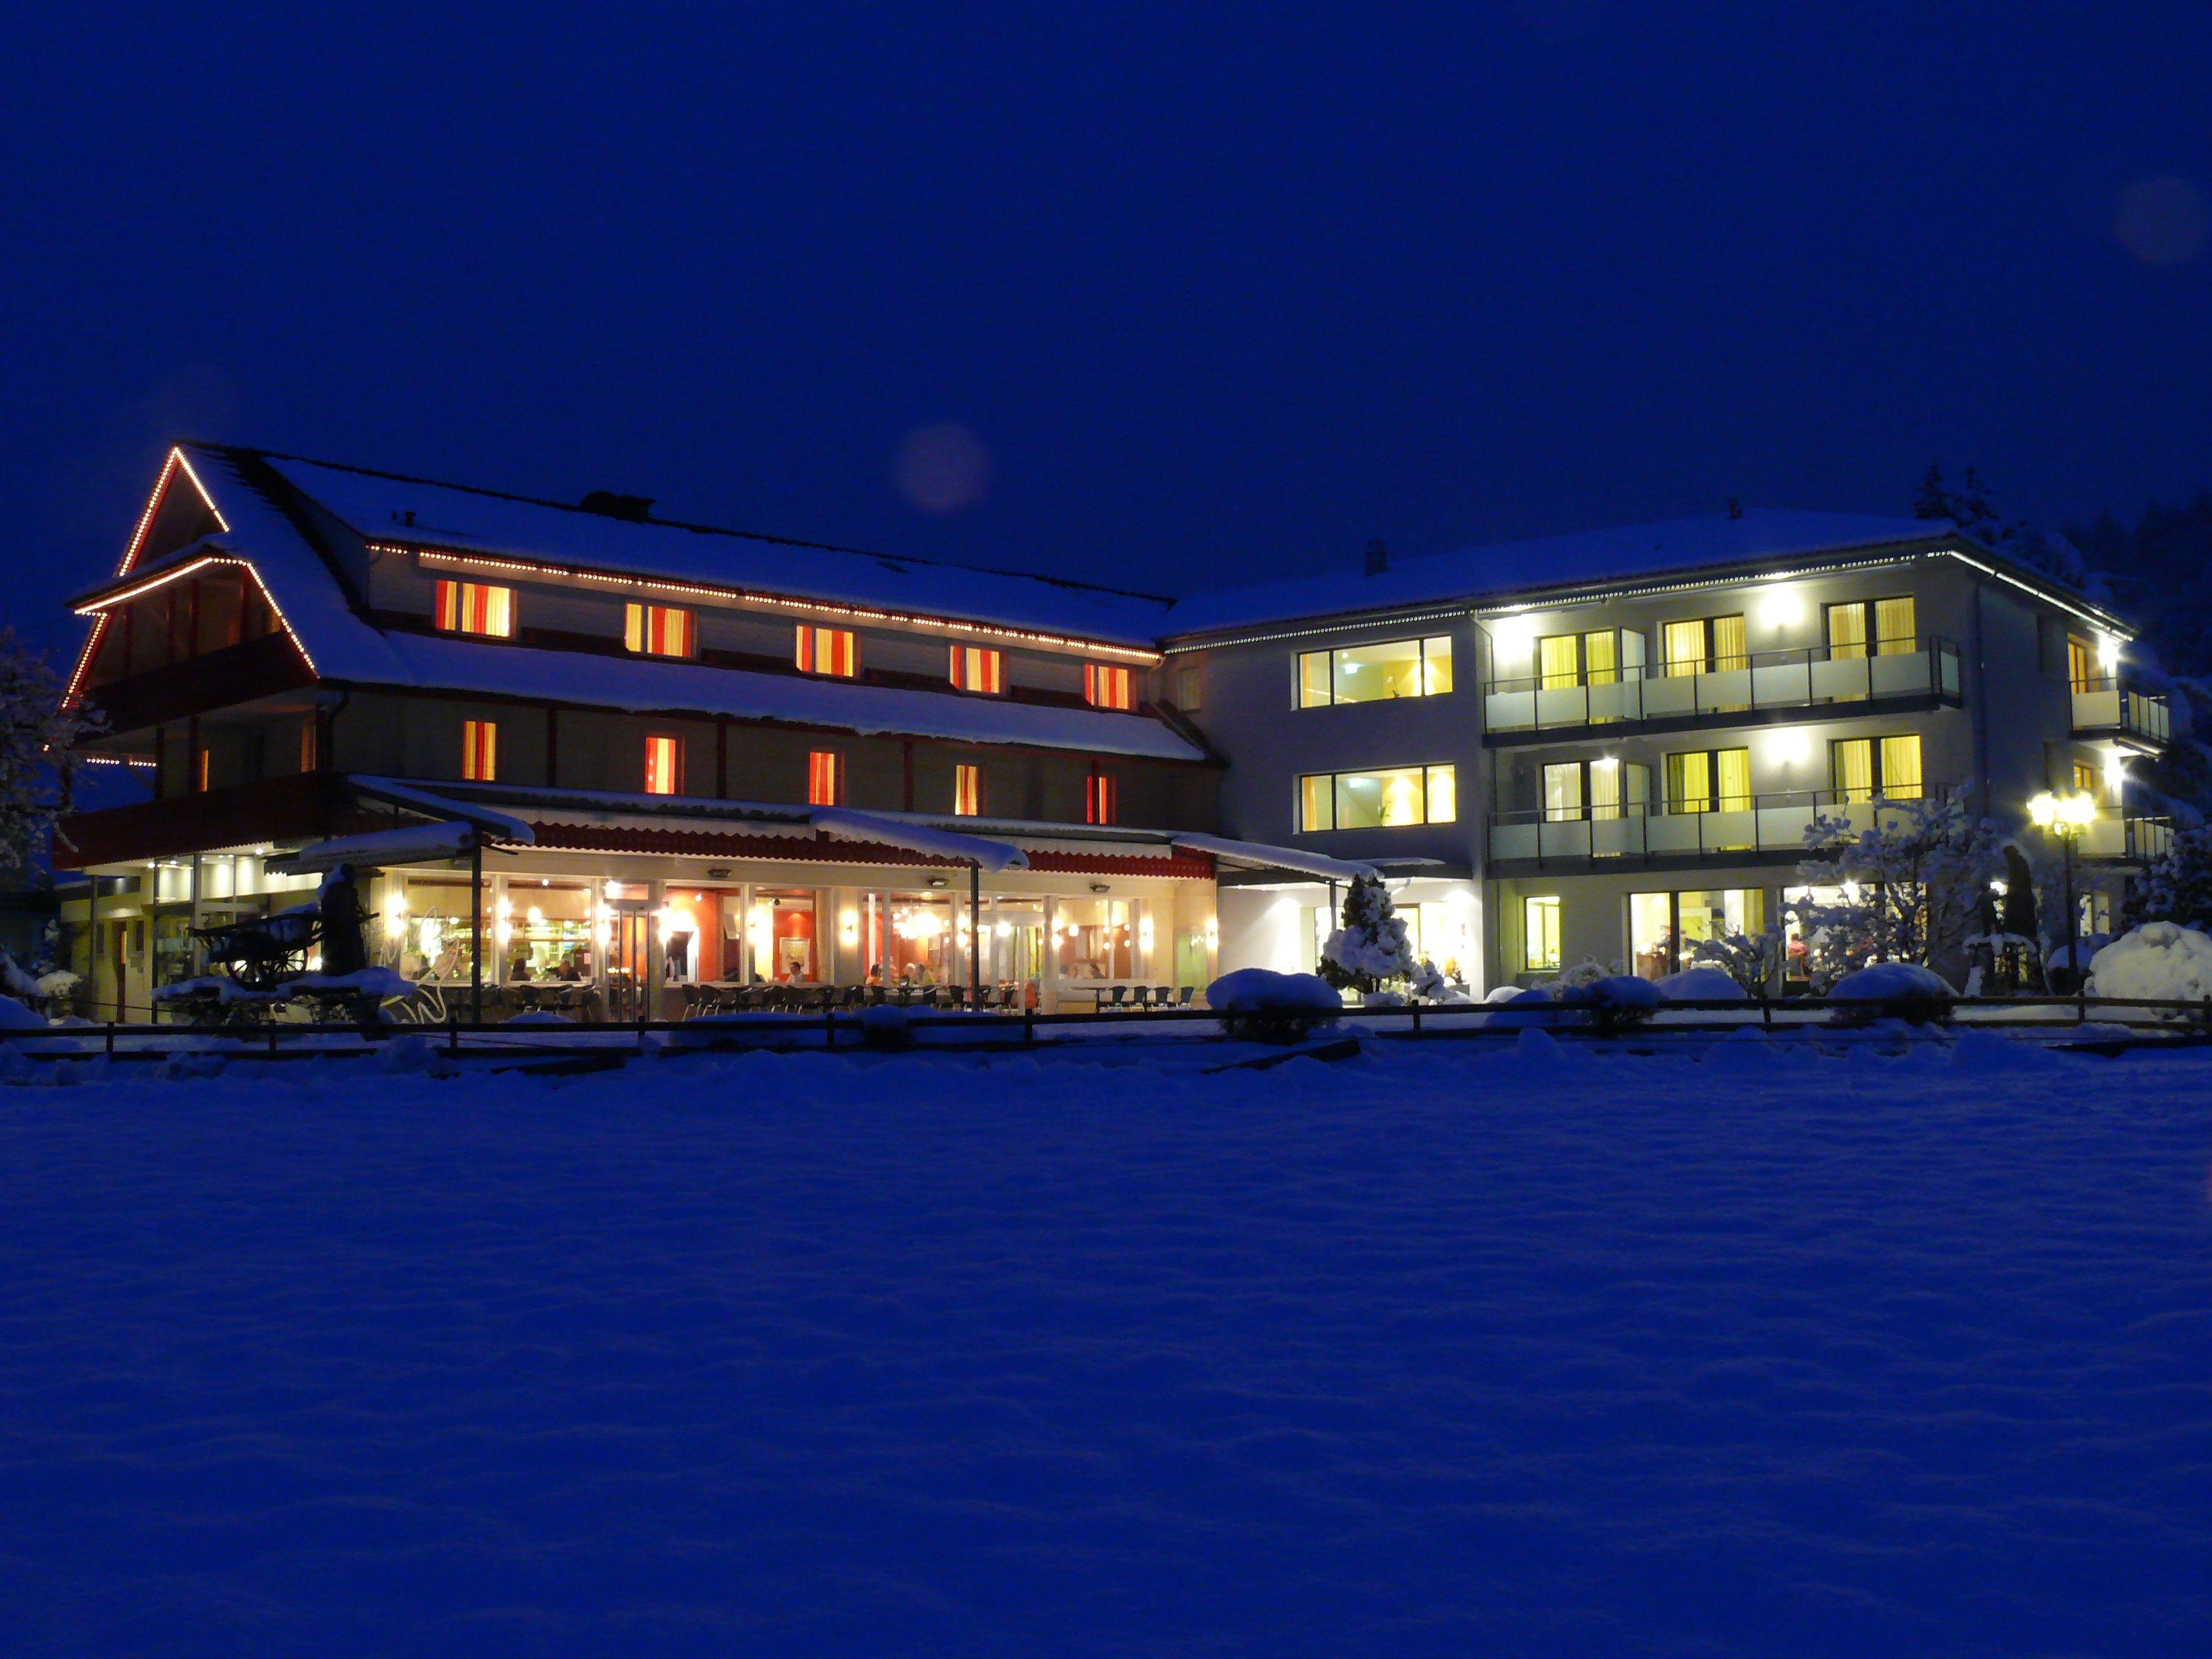 VCH-Hotel Eichberg, Seengen, Hallwilersee, Kanton Aargau ...